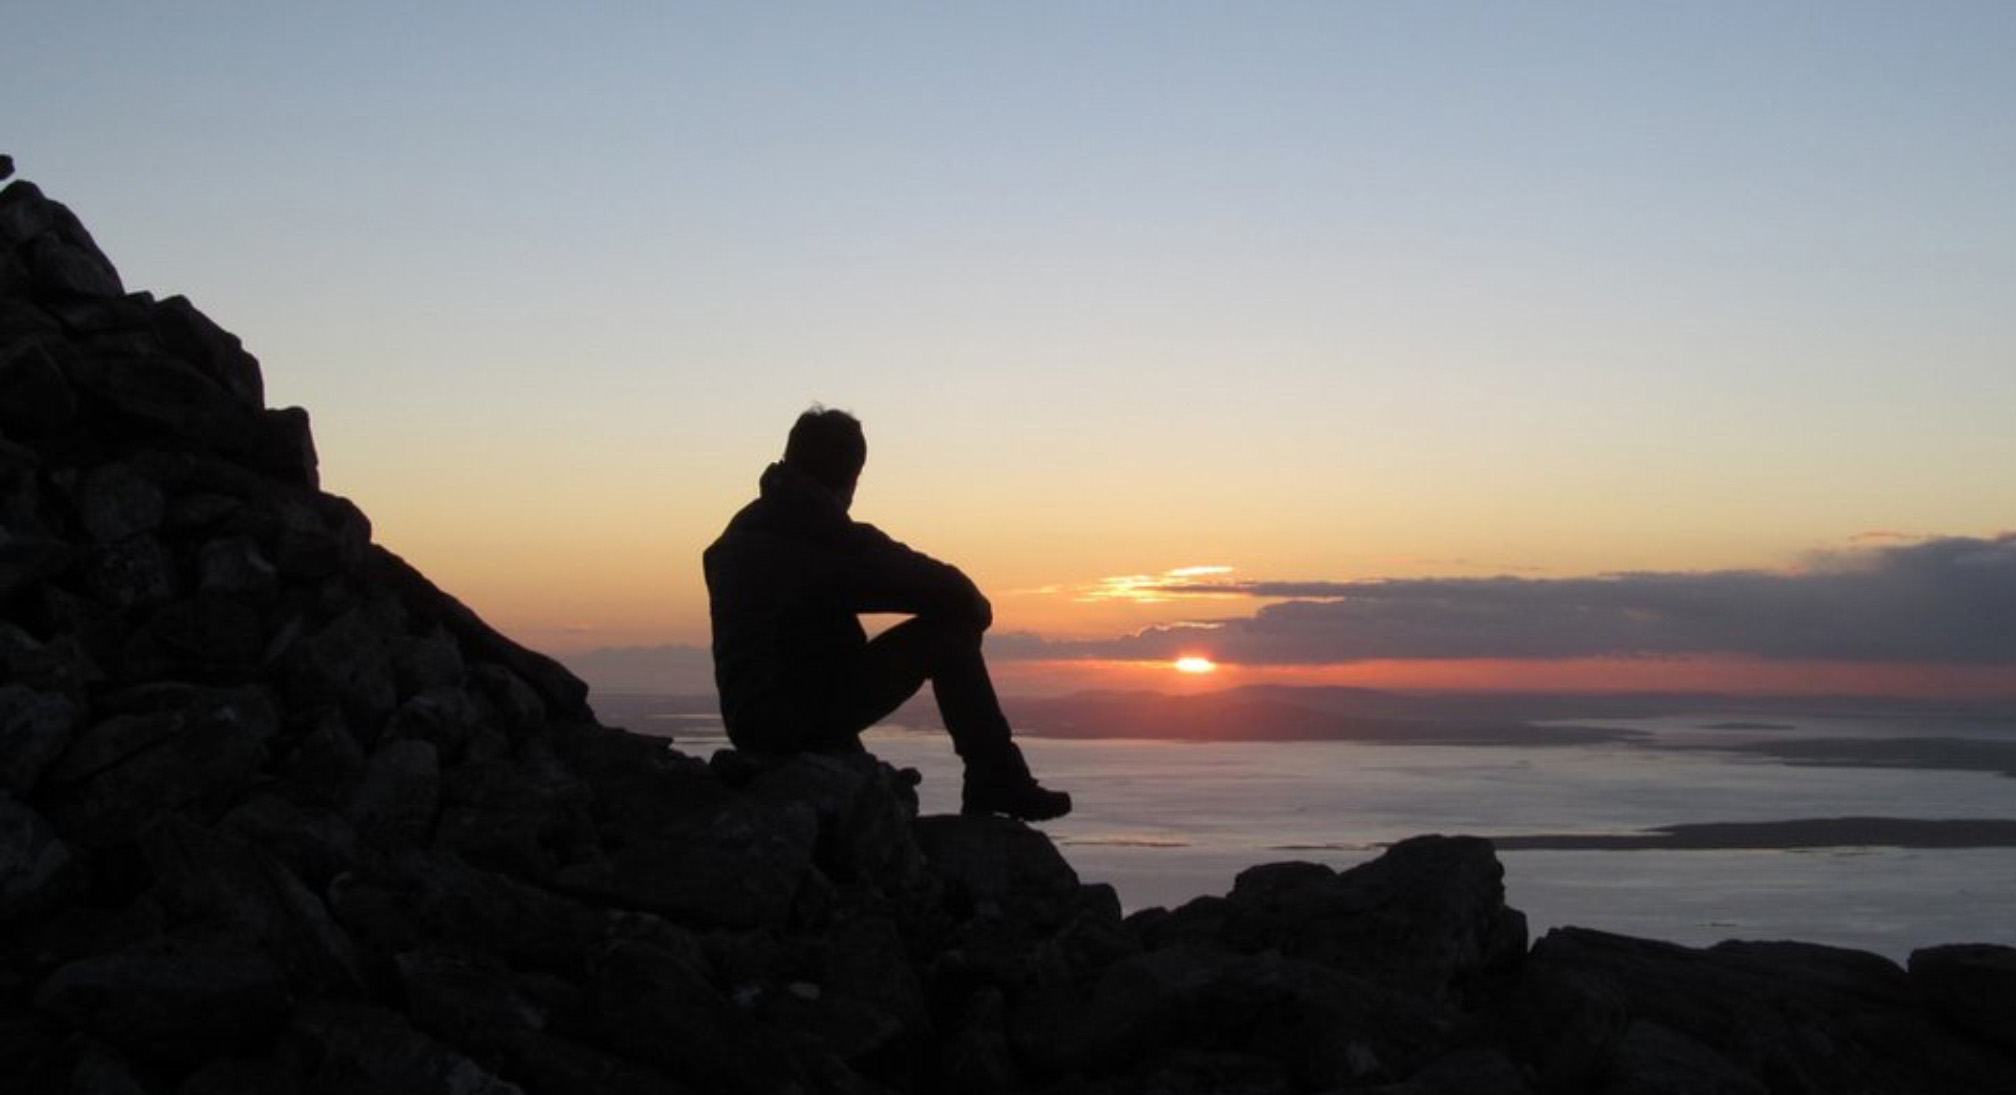 картинки парень сидит один на берегу моря меня морозилке